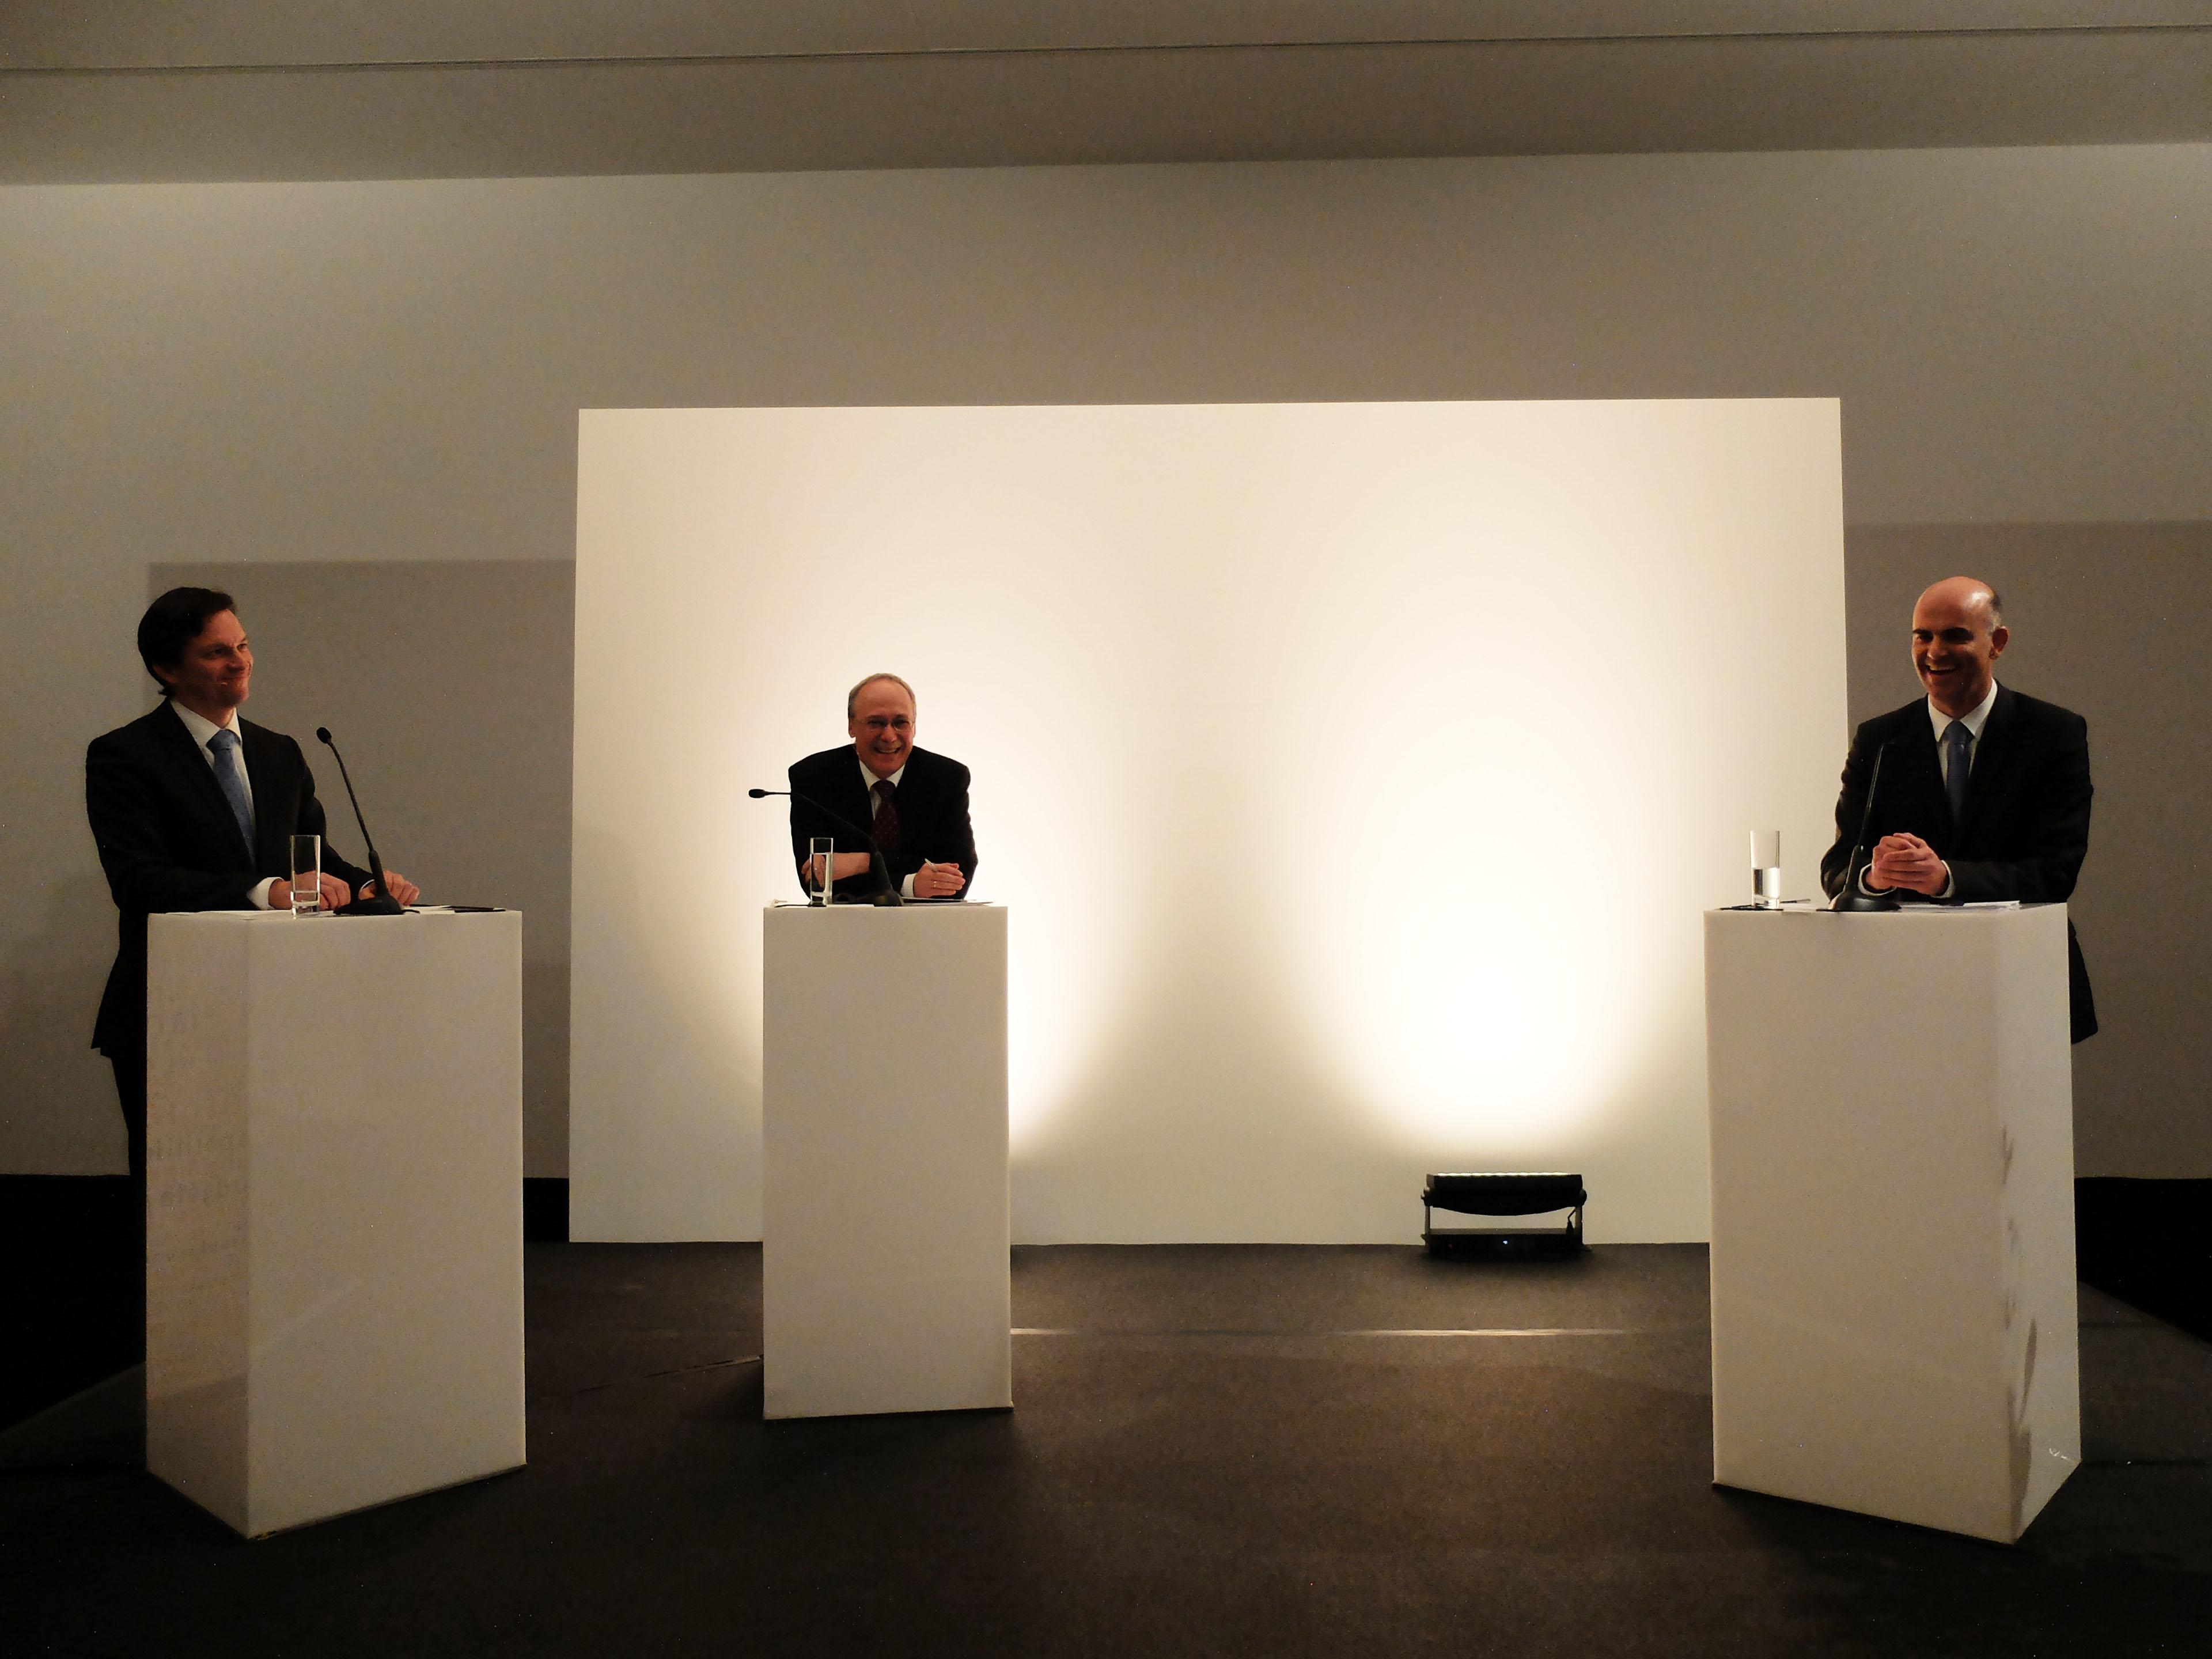 Jérôme Cosandey, Gerhard Schwarz e Alain Berset